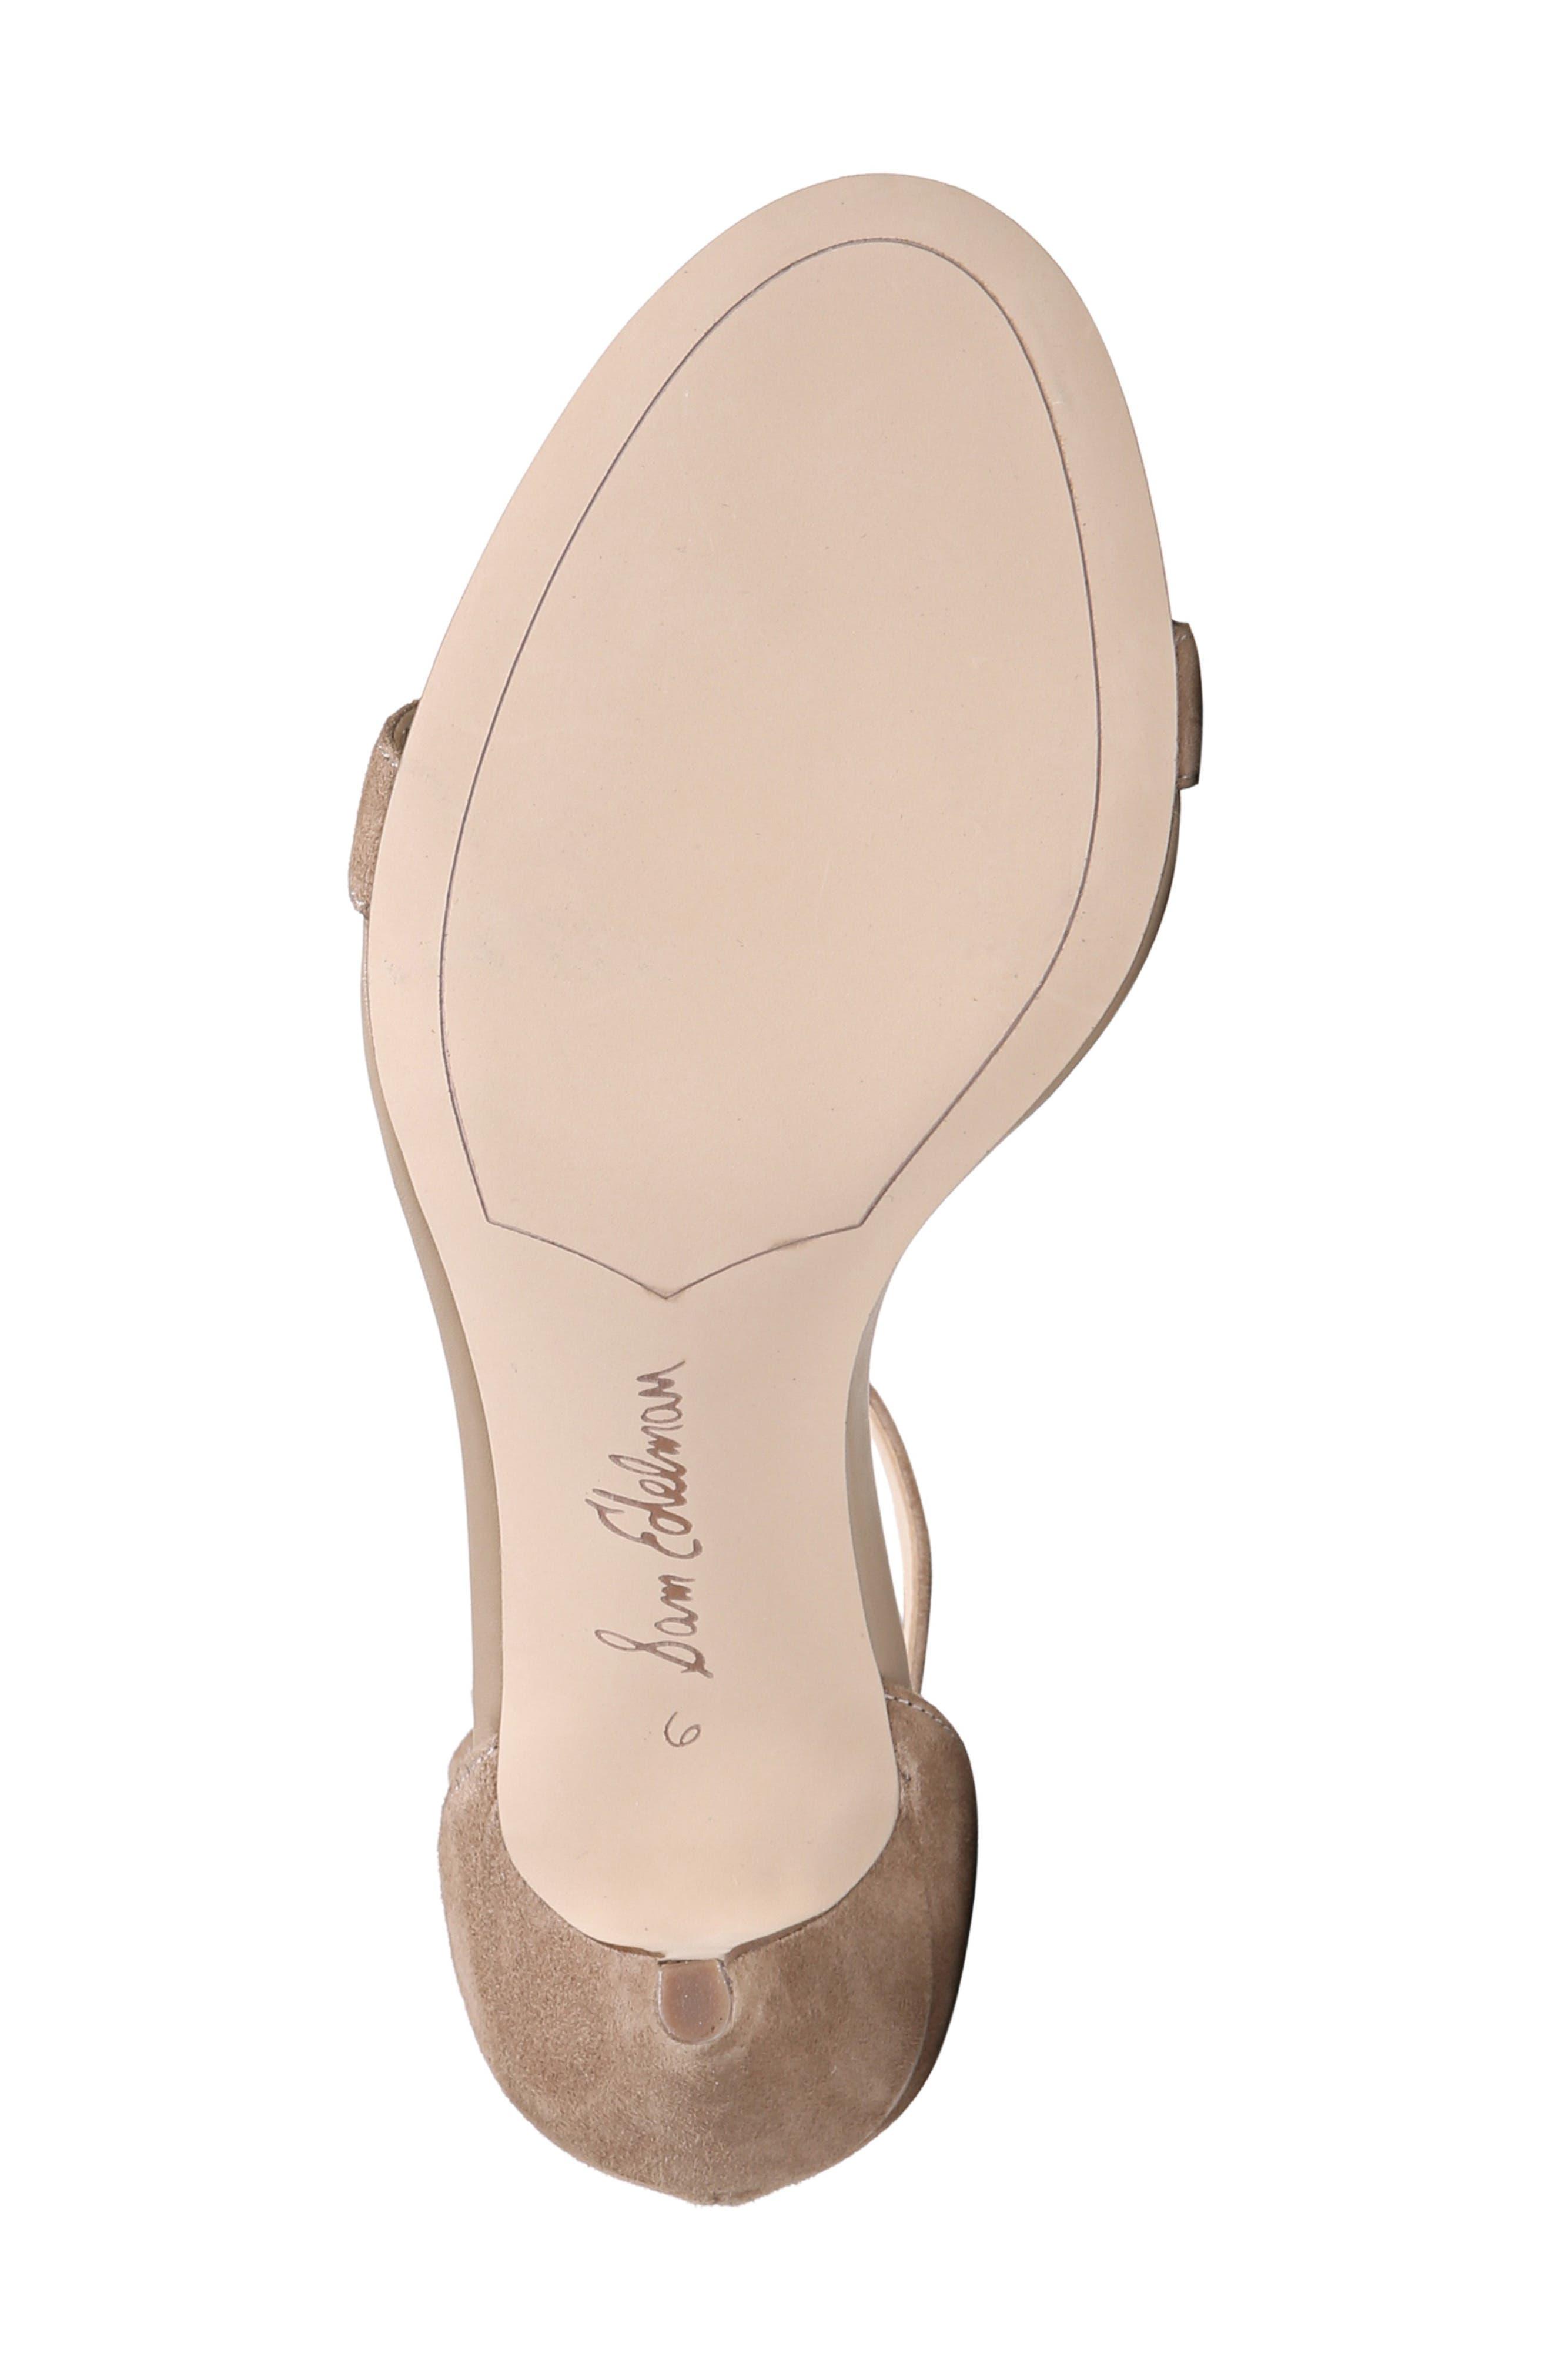 ,                             'Patti' Ankle Strap Sandal,                             Alternate thumbnail 93, color,                             254